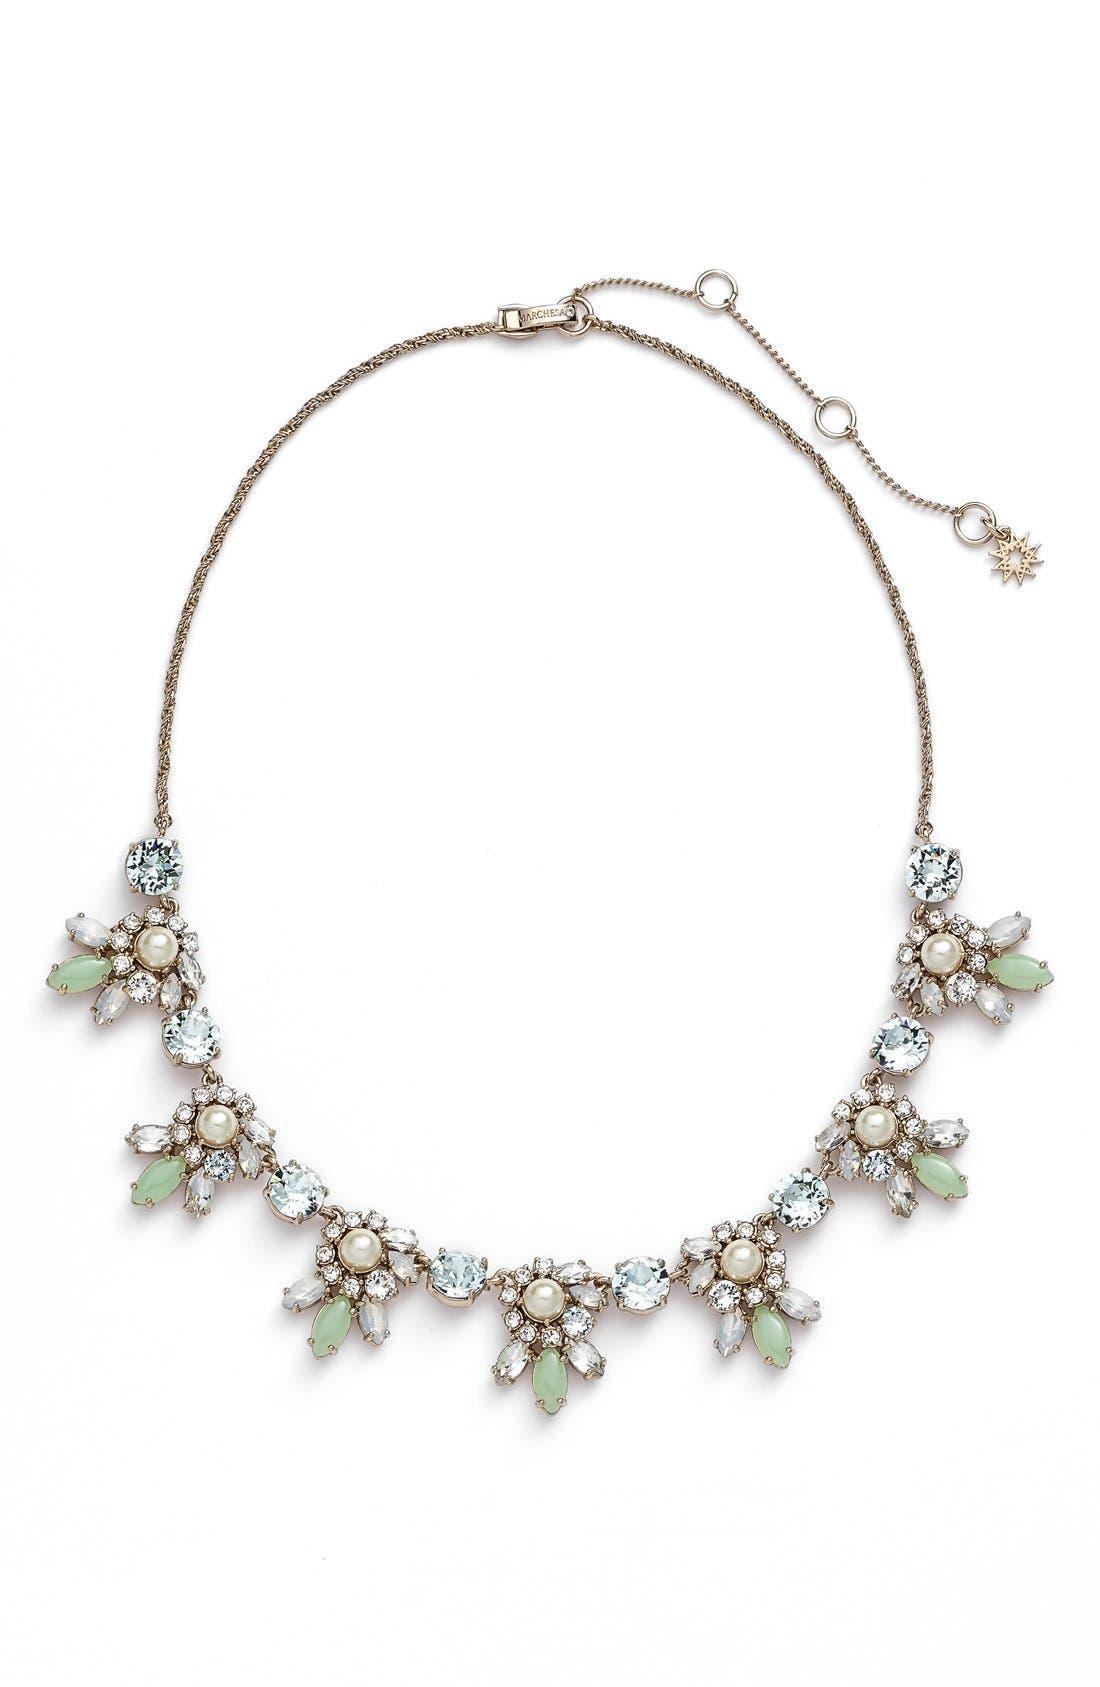 Alternate Image 1 Selected - Marchesa Crystal Cluster Bib Necklace